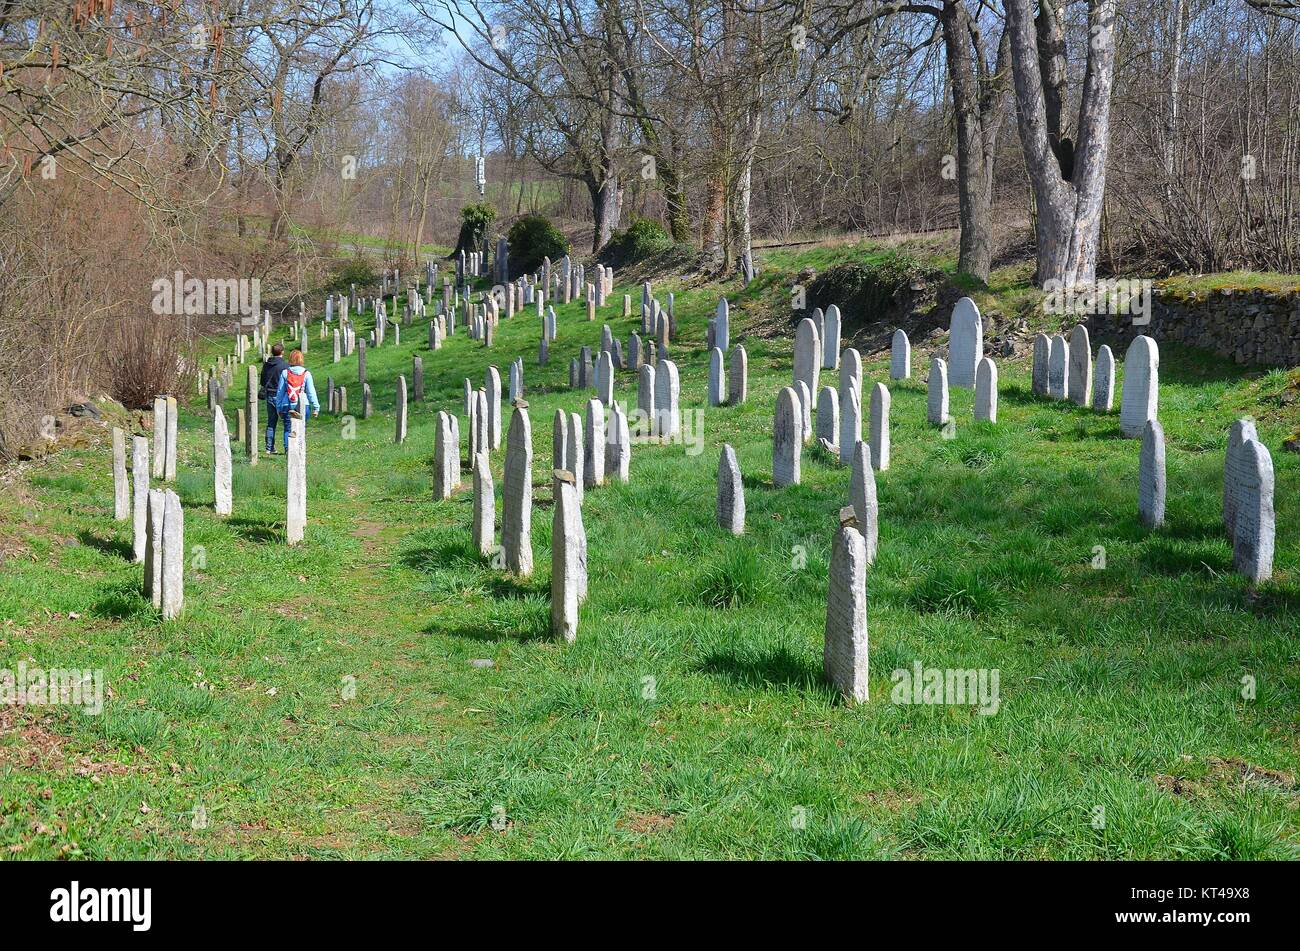 Švihov (Schwihau) in the Czech Republic: the Jewish graveyard - Stock Image